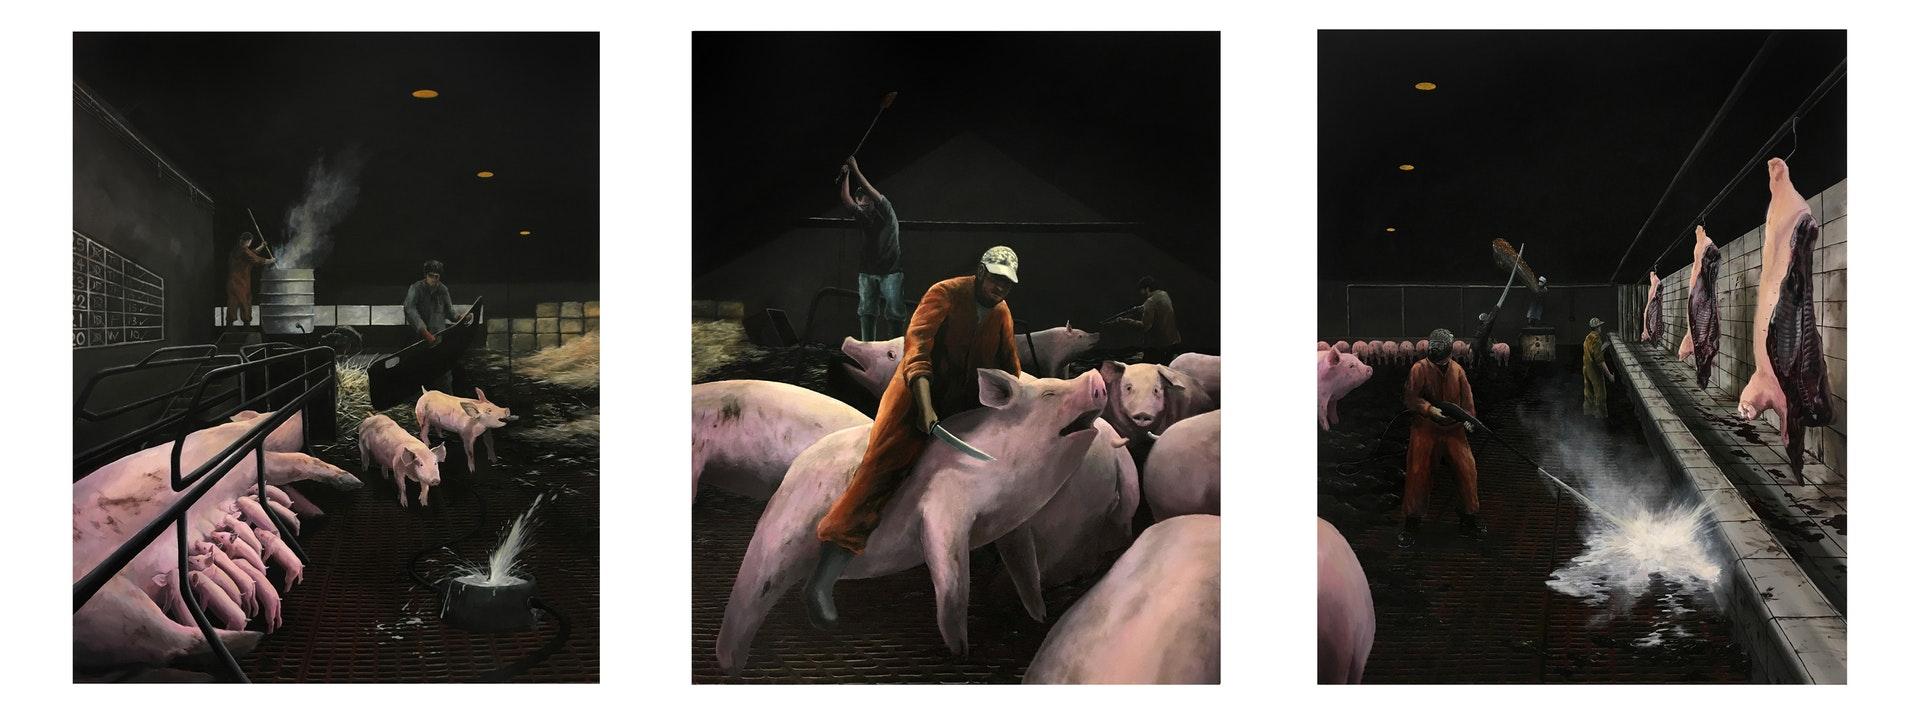 Esmond Loh  Pig Farm  Acrylic on Canvas, 152 x 366 x 2 cm